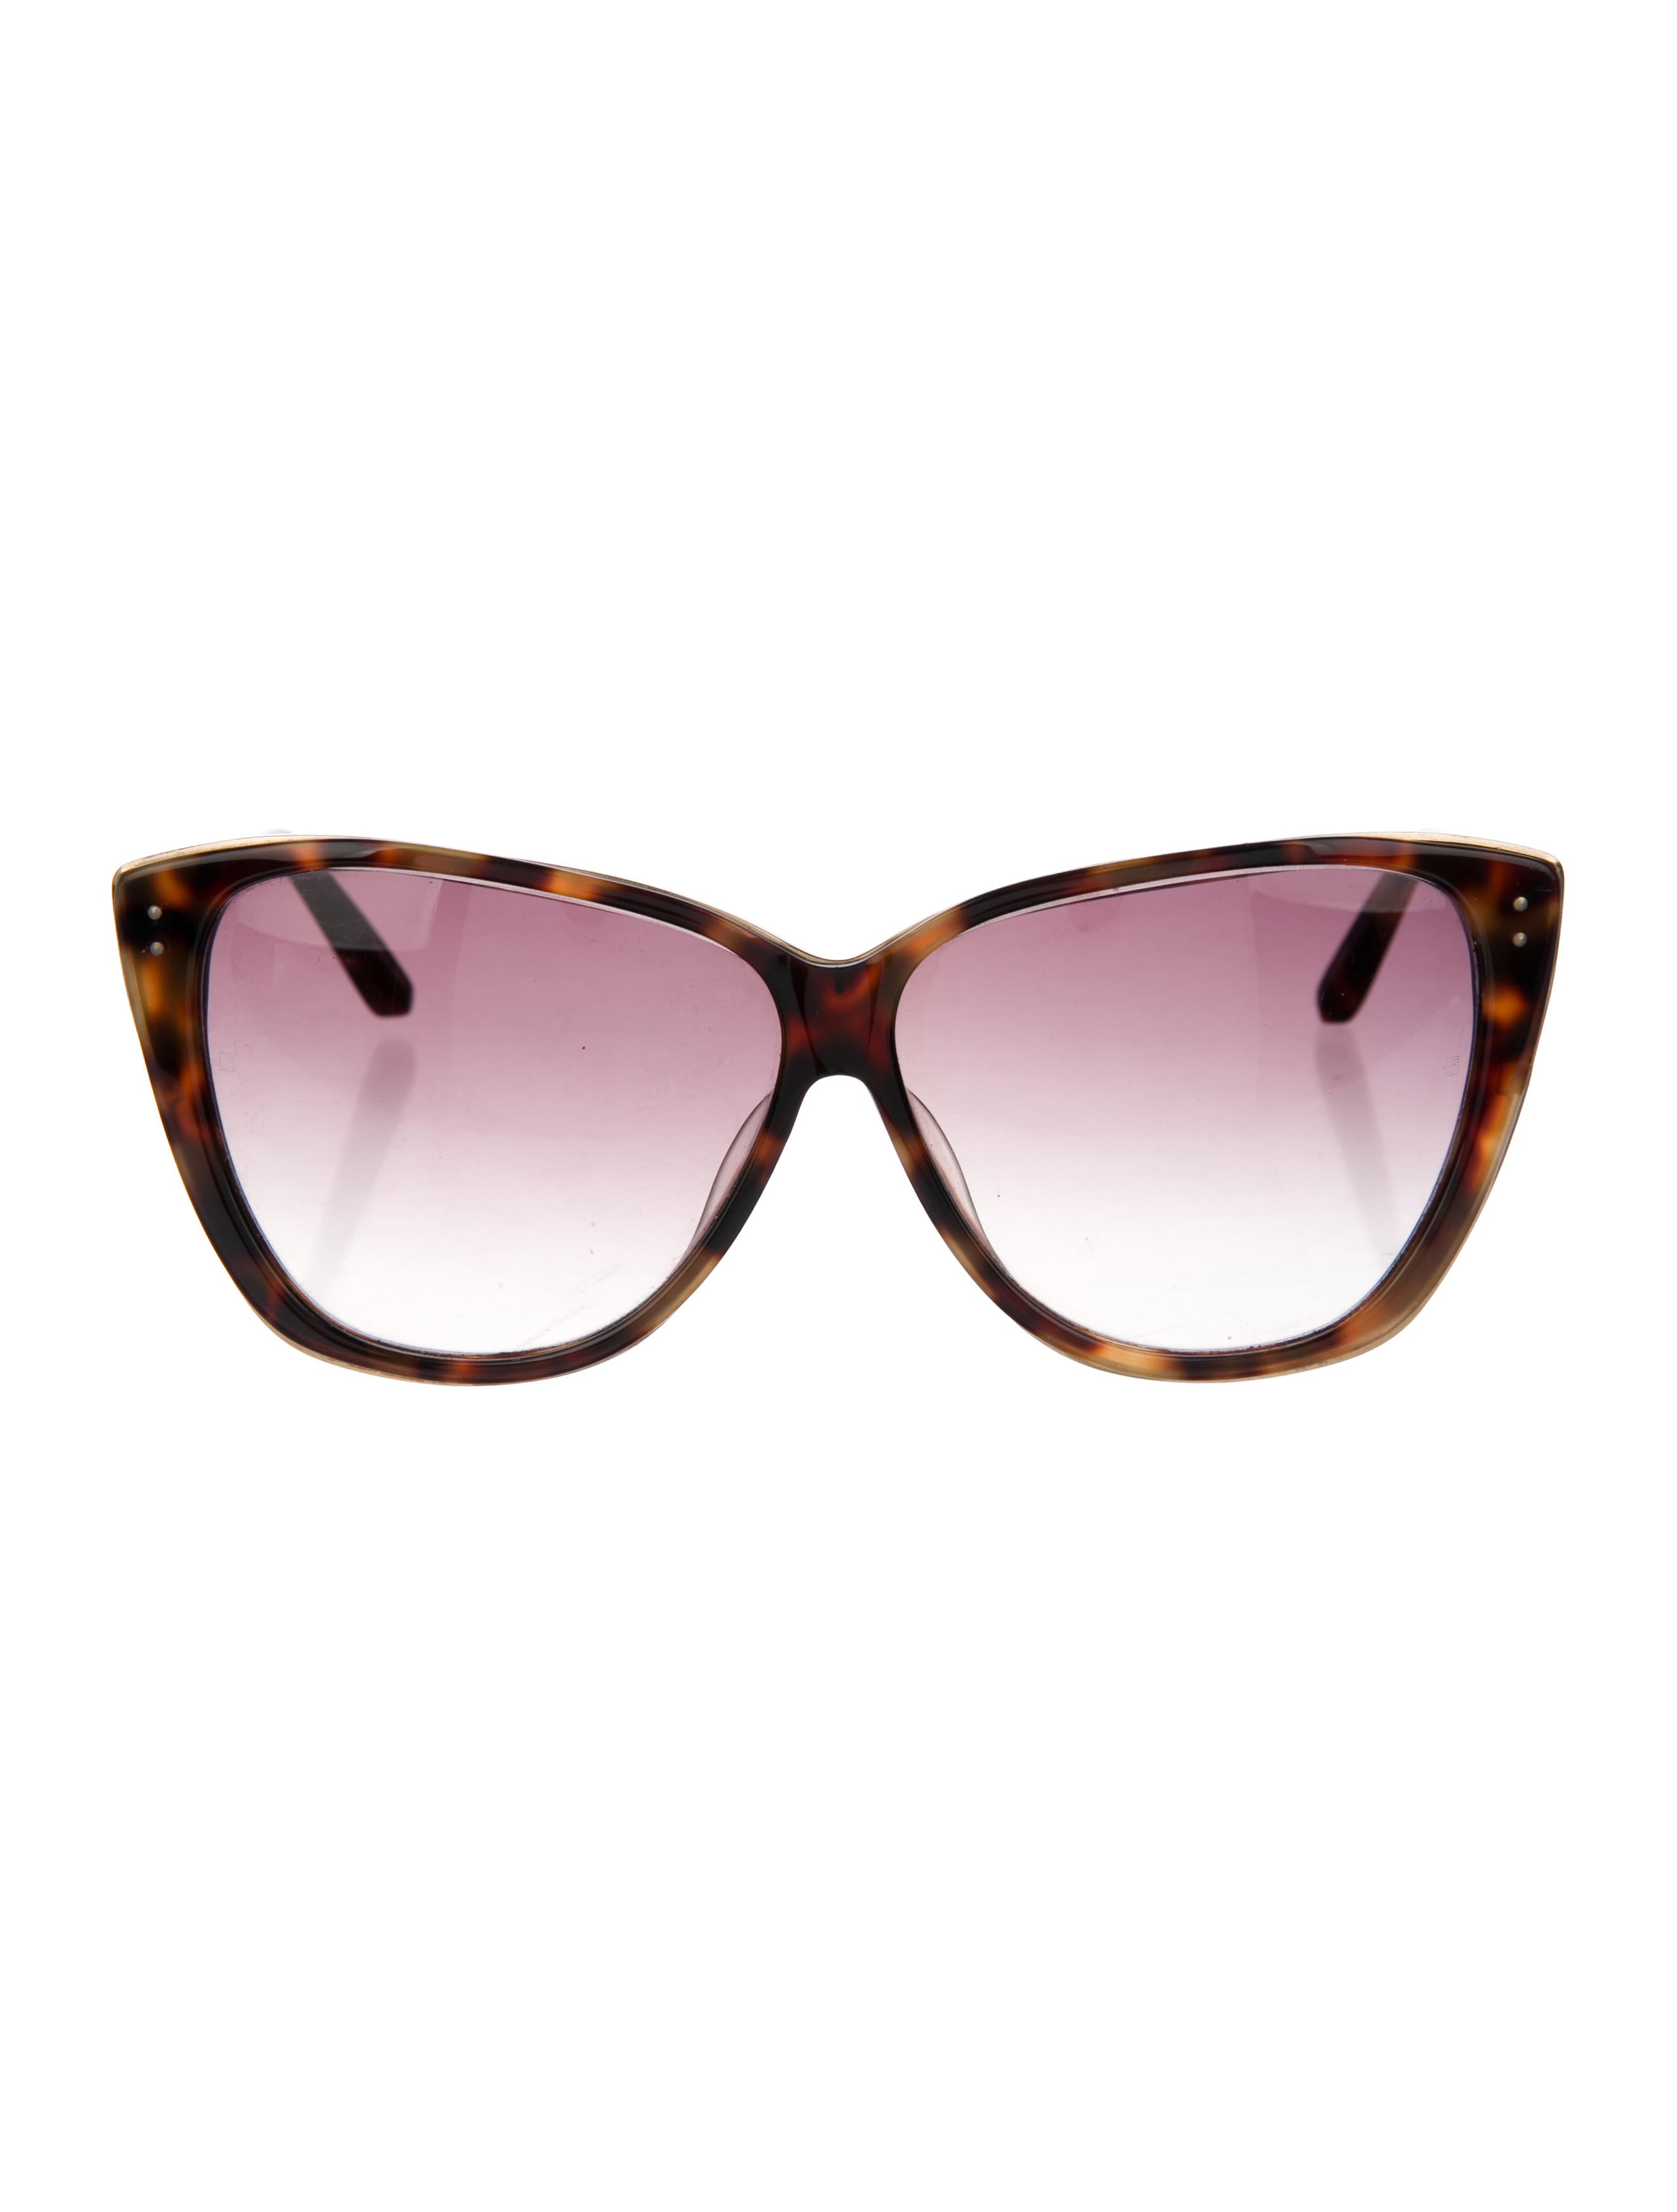 41c5fcf929bc ... Linda Farrow Oversize Tortoiseshell Sunglasses. Oversize Tortoiseshell  Sunglasses